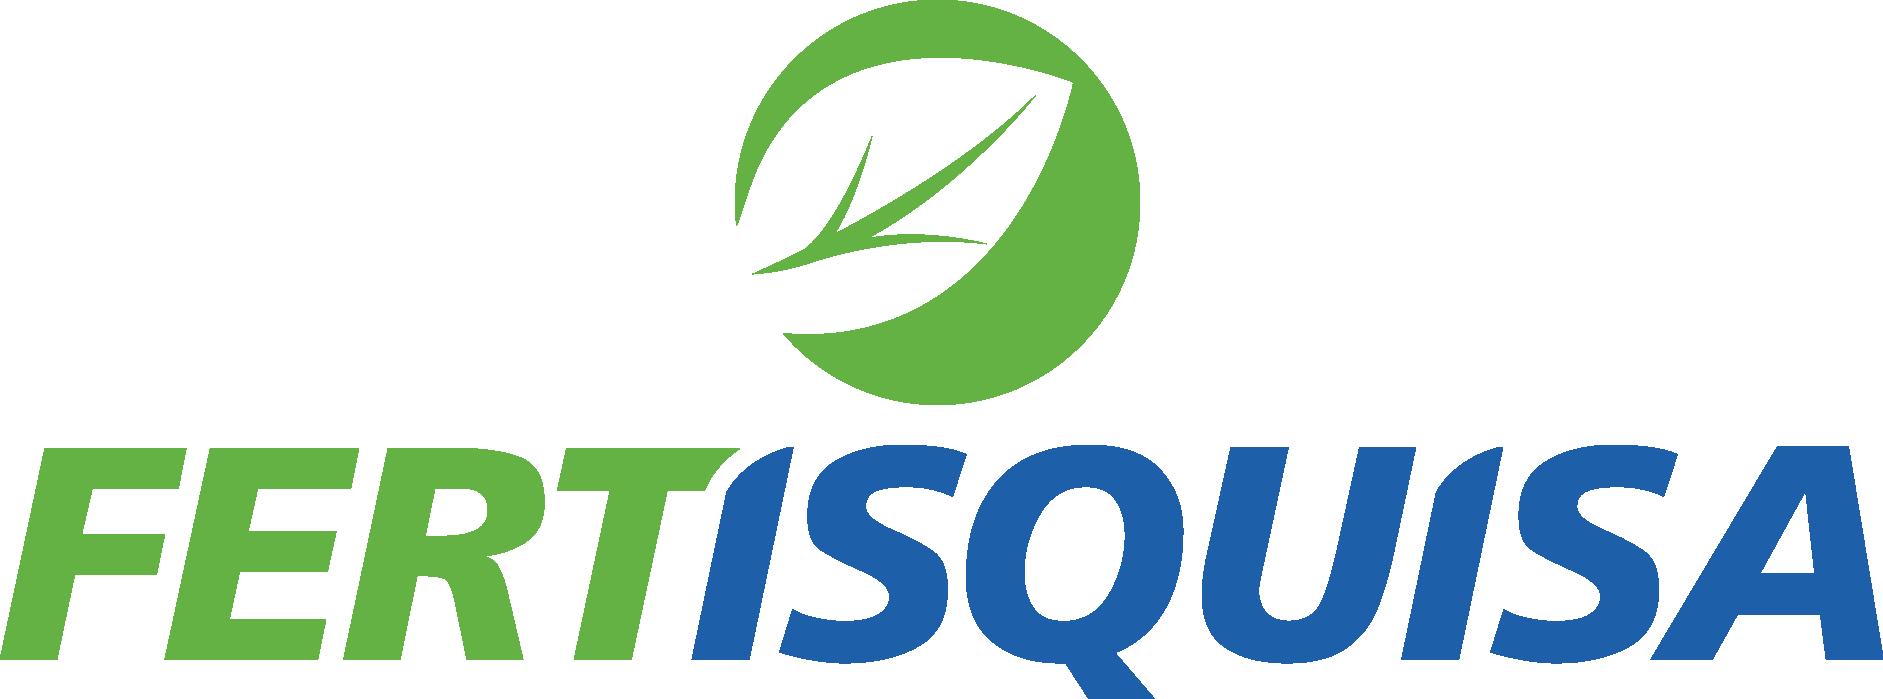 Logo Fertisquisa